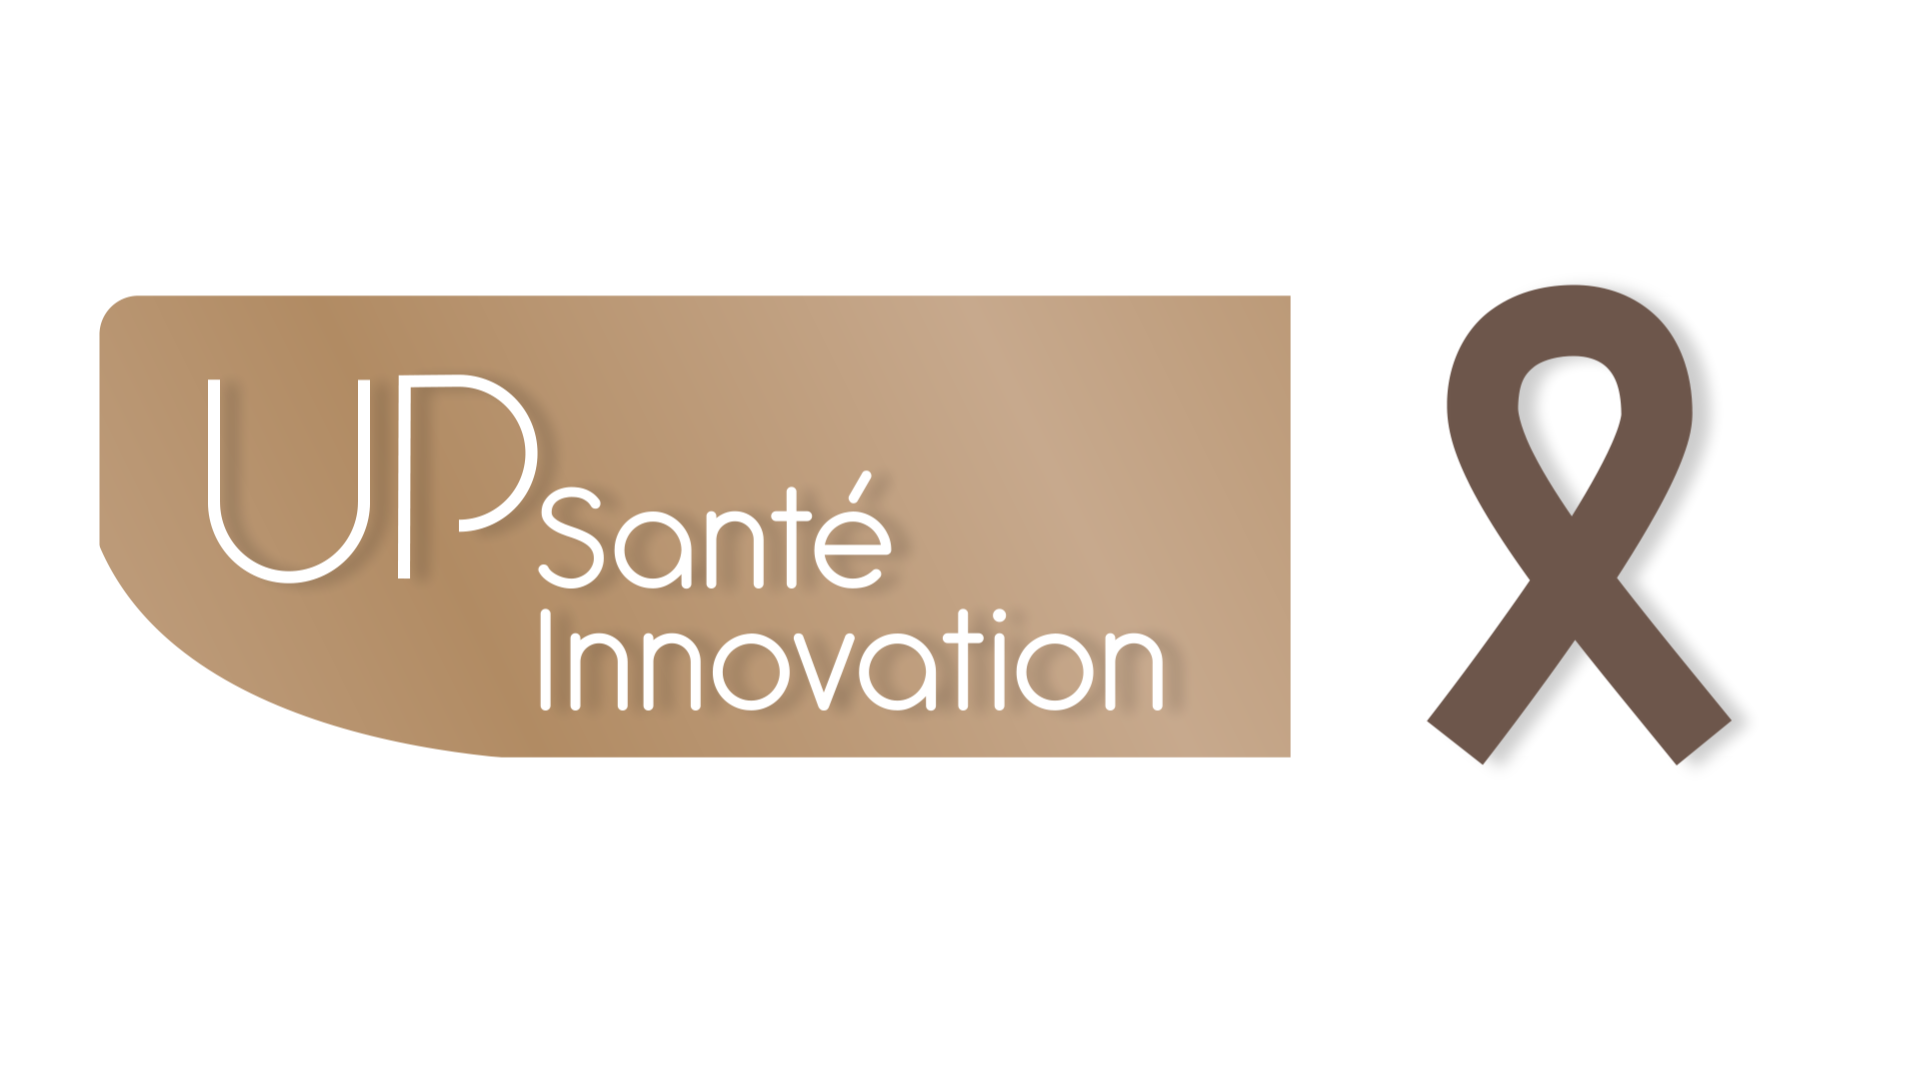 UPSante 2017 10 Prevention Masque